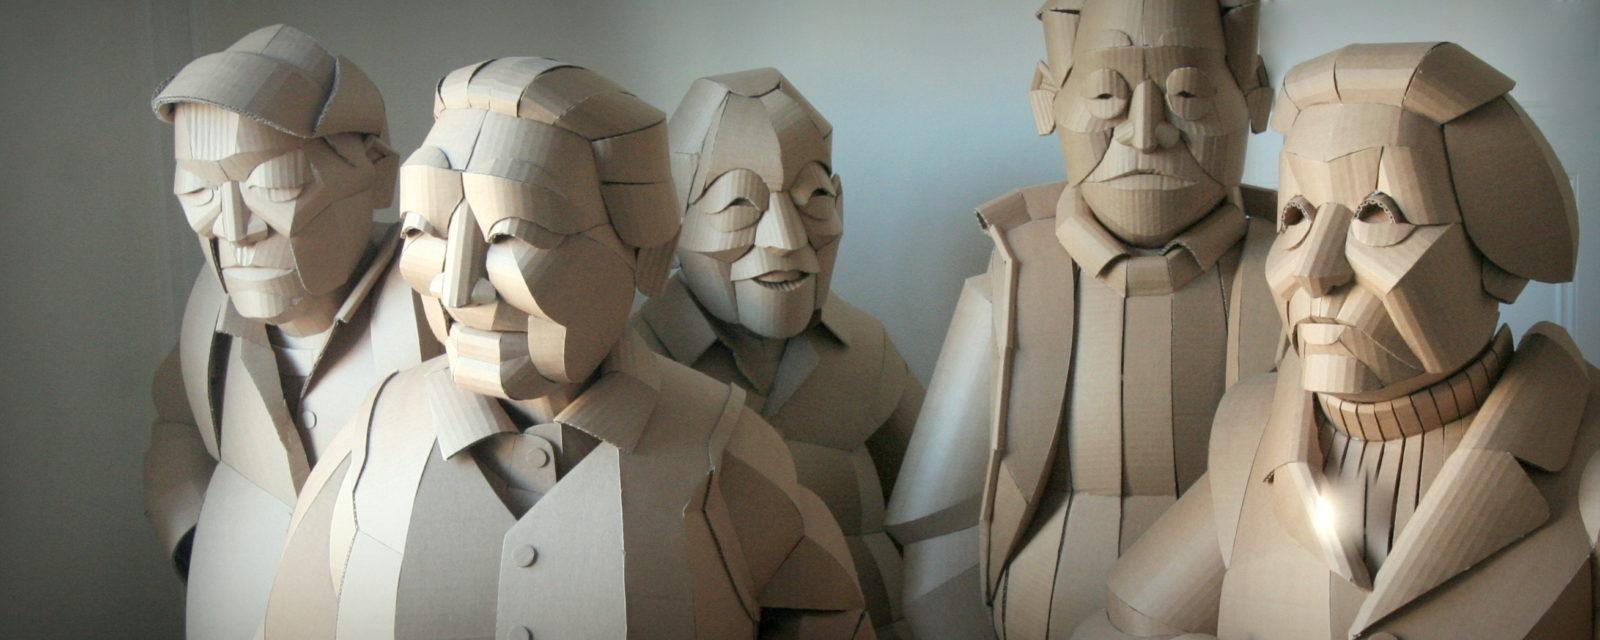 Esculturas de cartón de Warren King - Imagen: Galleria Sculptor, Helsinki